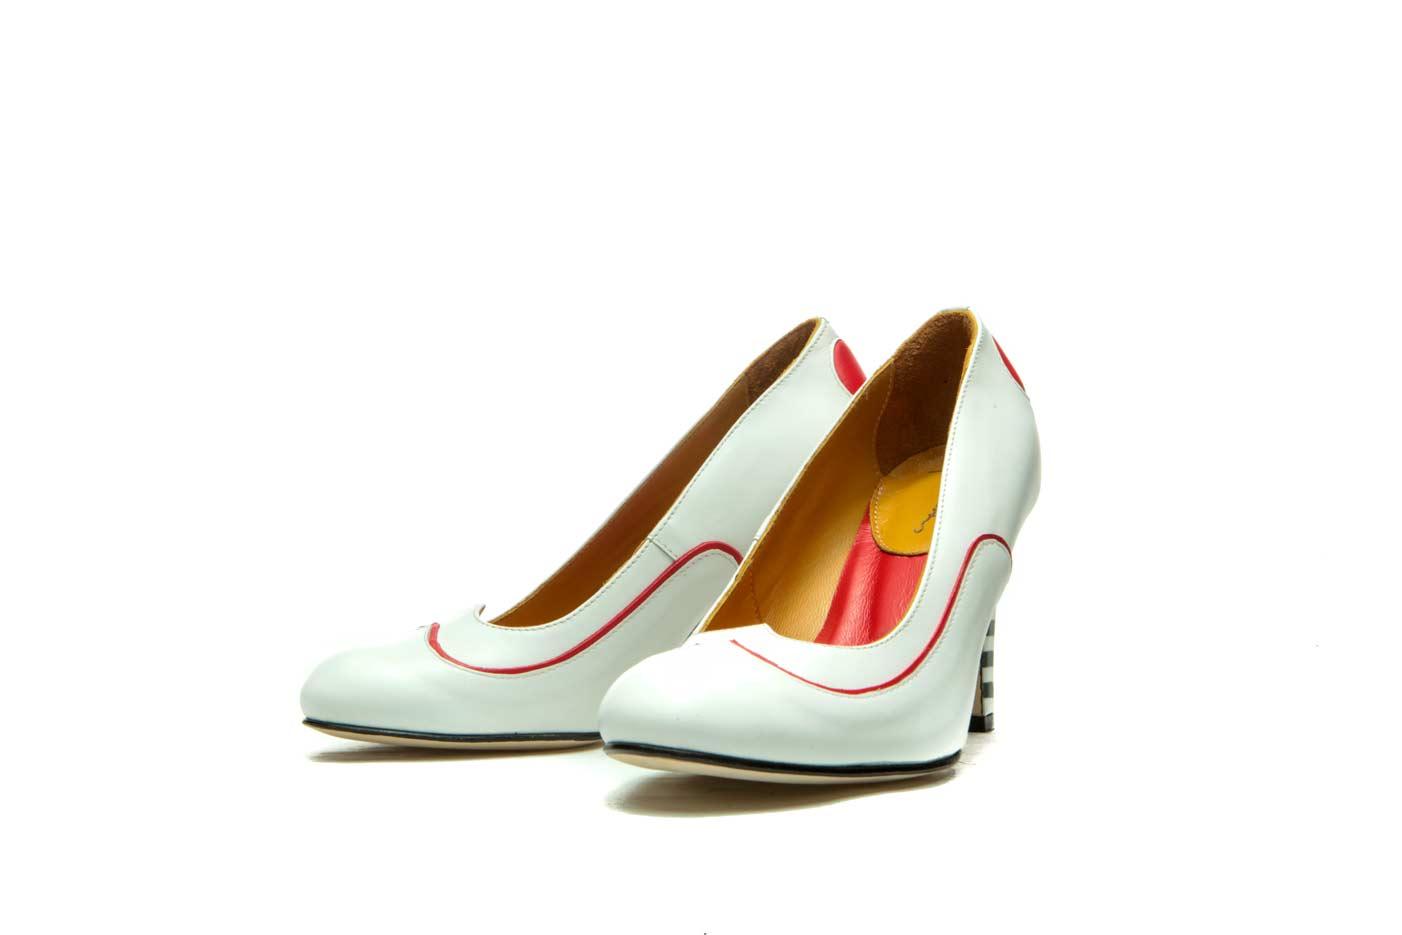 White high heels | Milenika shoes